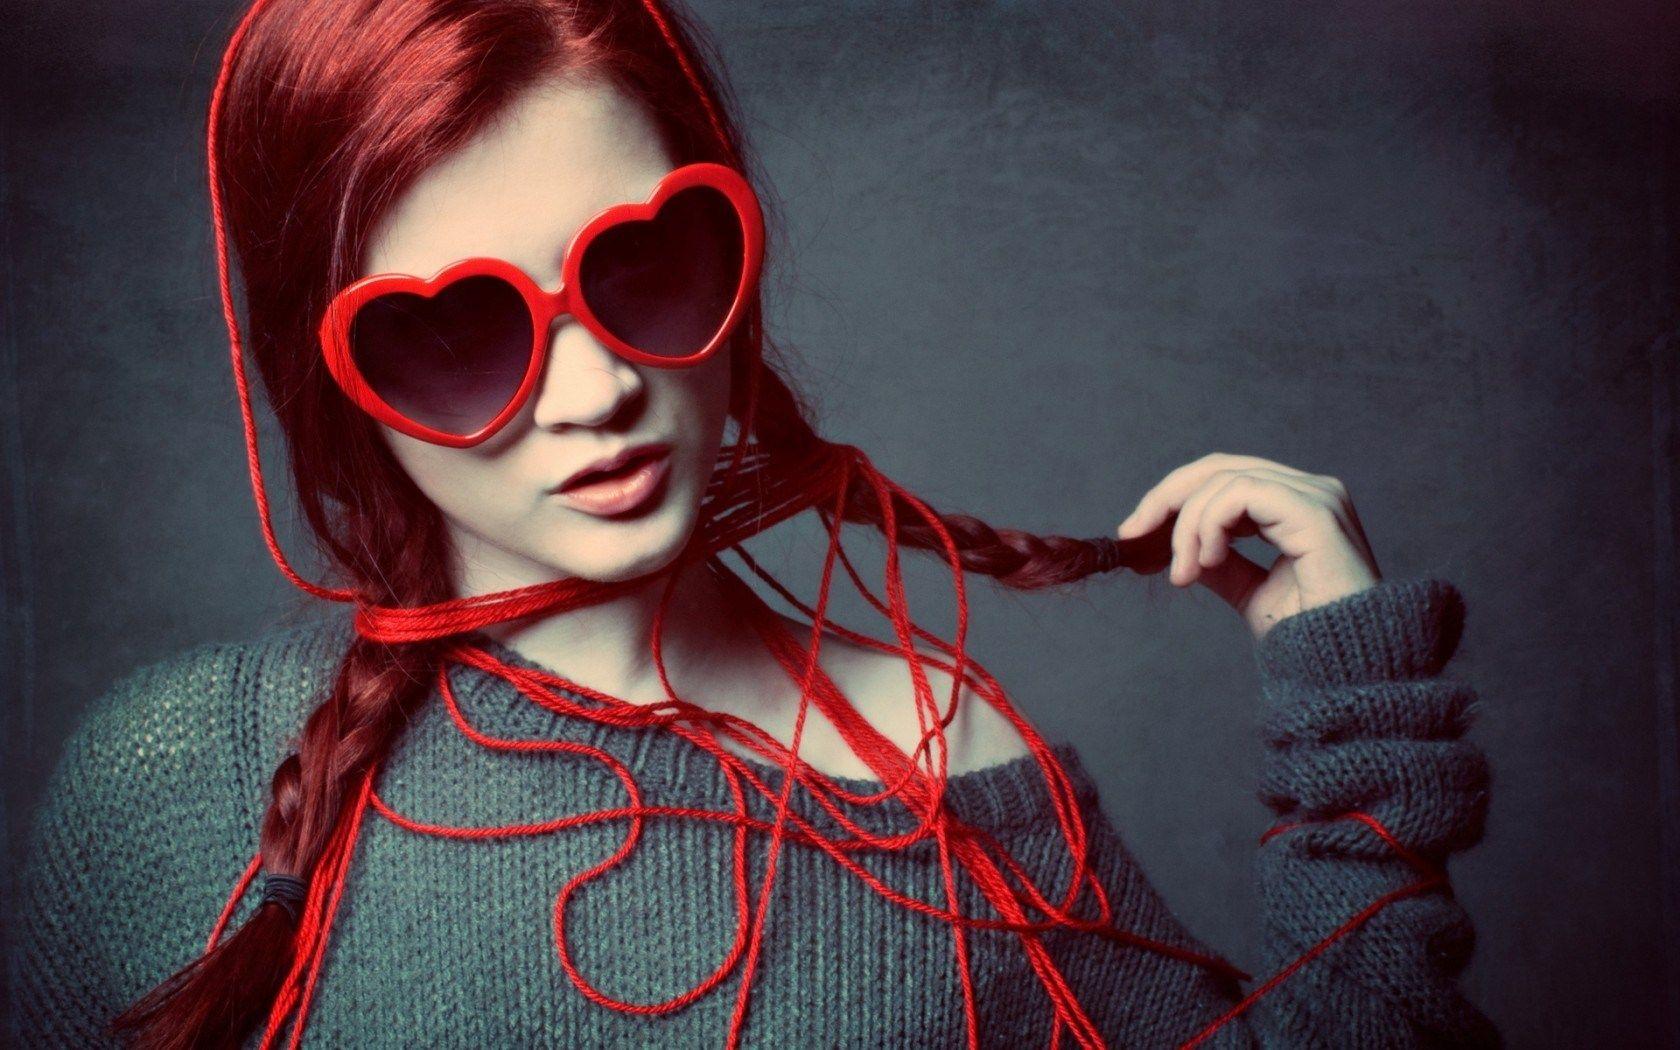 fashion sunglasses  Redhead Girl Heart Shape Sunglasses Thread HD Wallpaper